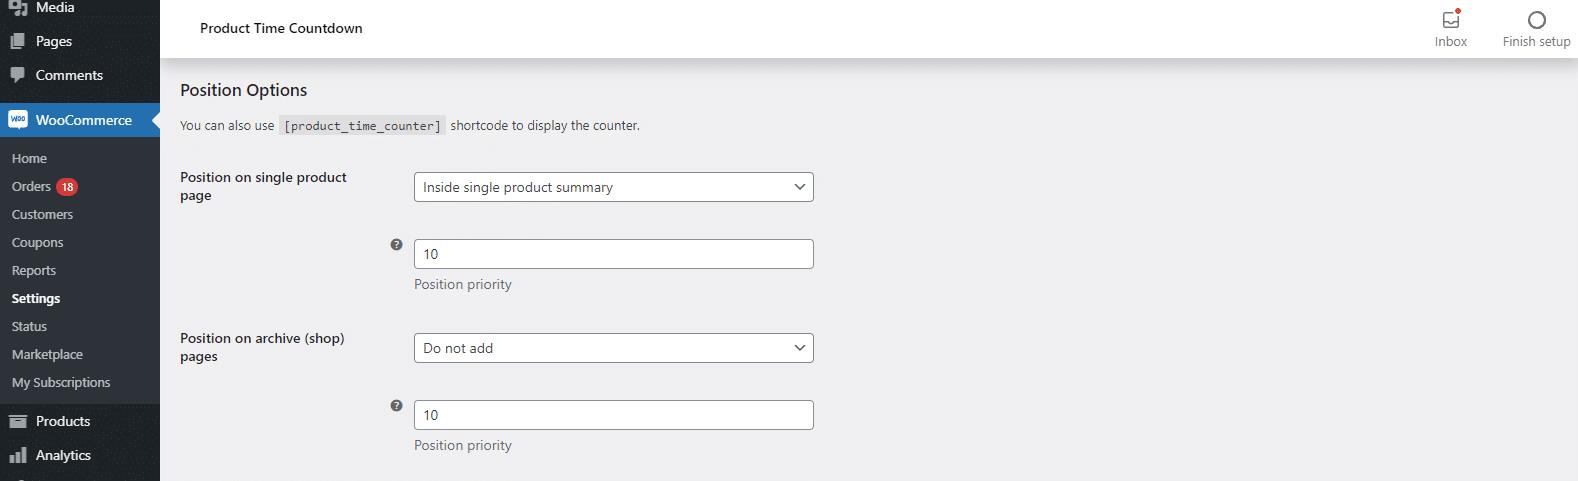 ptcfwc-position-options